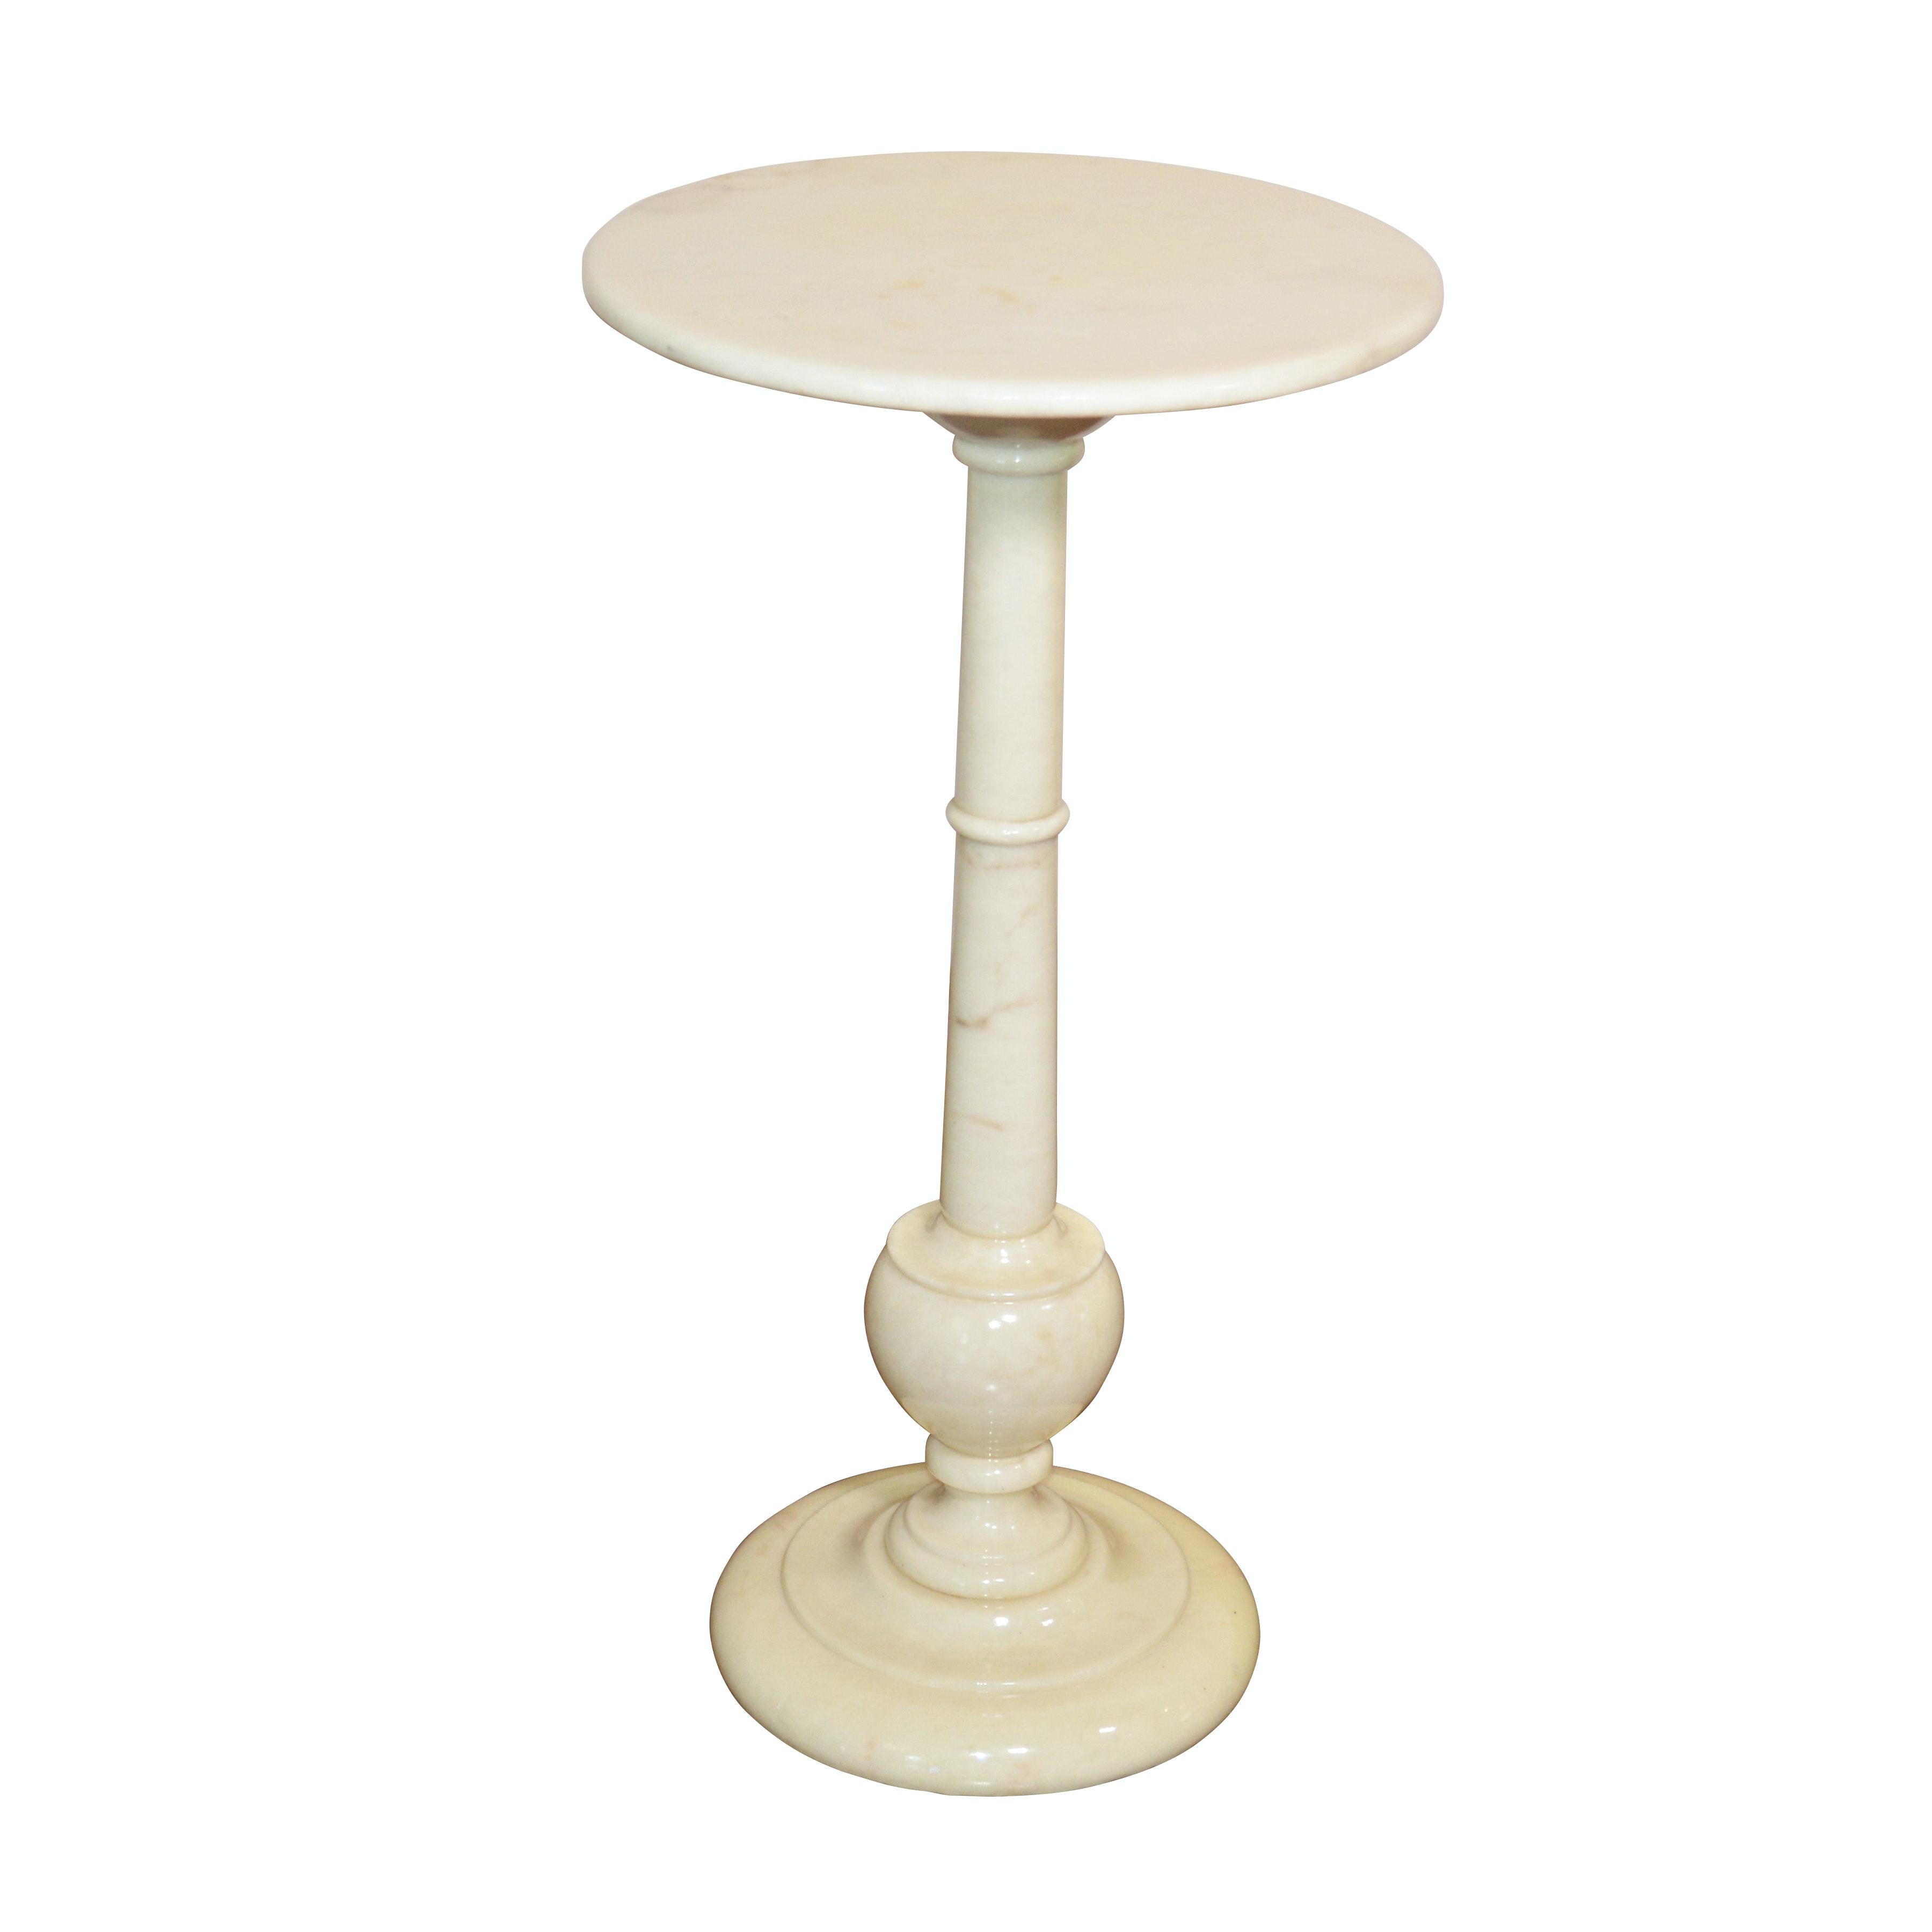 Italian Florentia Marble Pedestal Accent Table, Mid-Late 20th Century